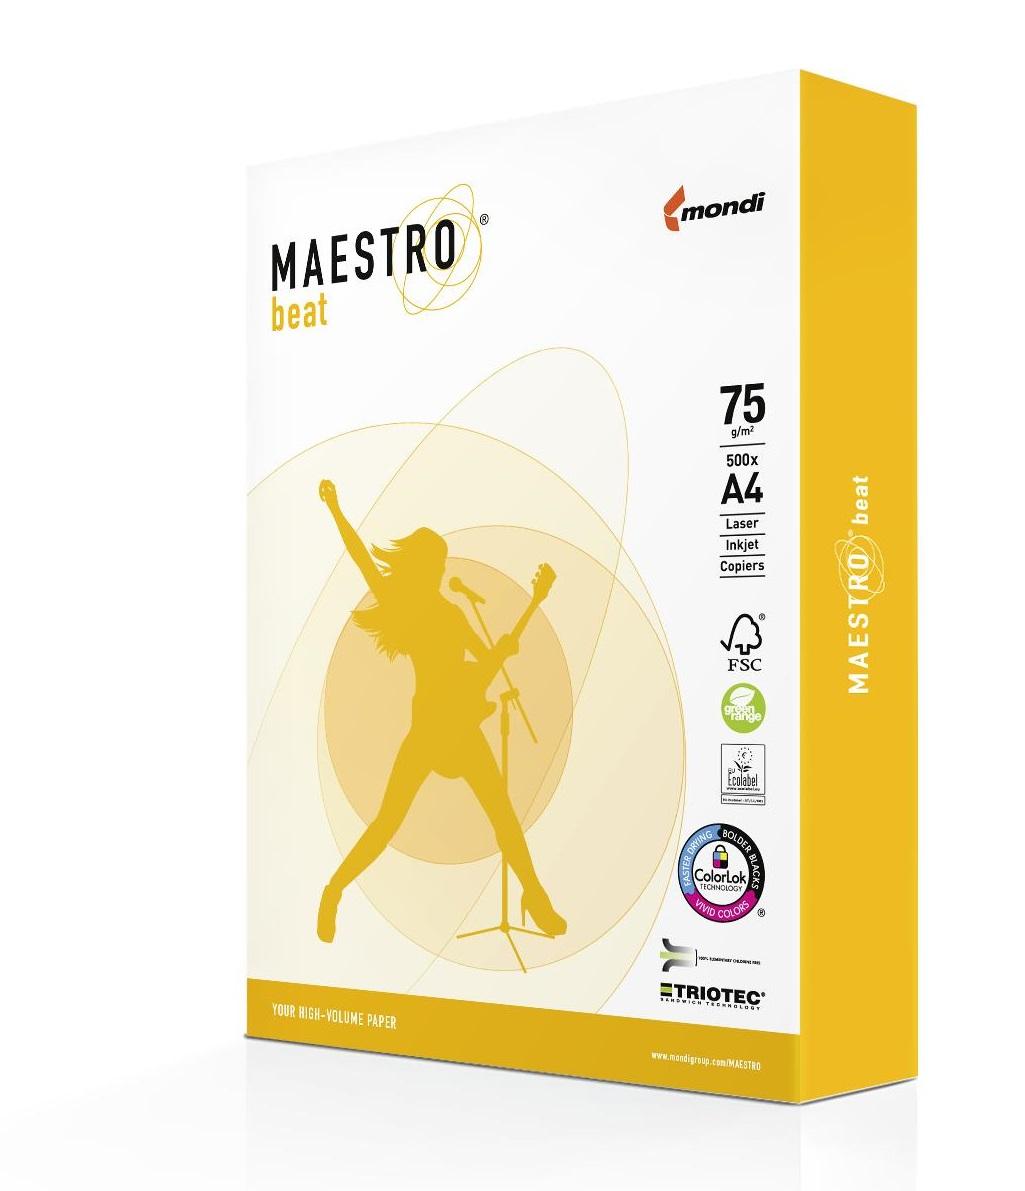 Maestro beat 75g/m² DIN-A4 - 500 Blatt weiß